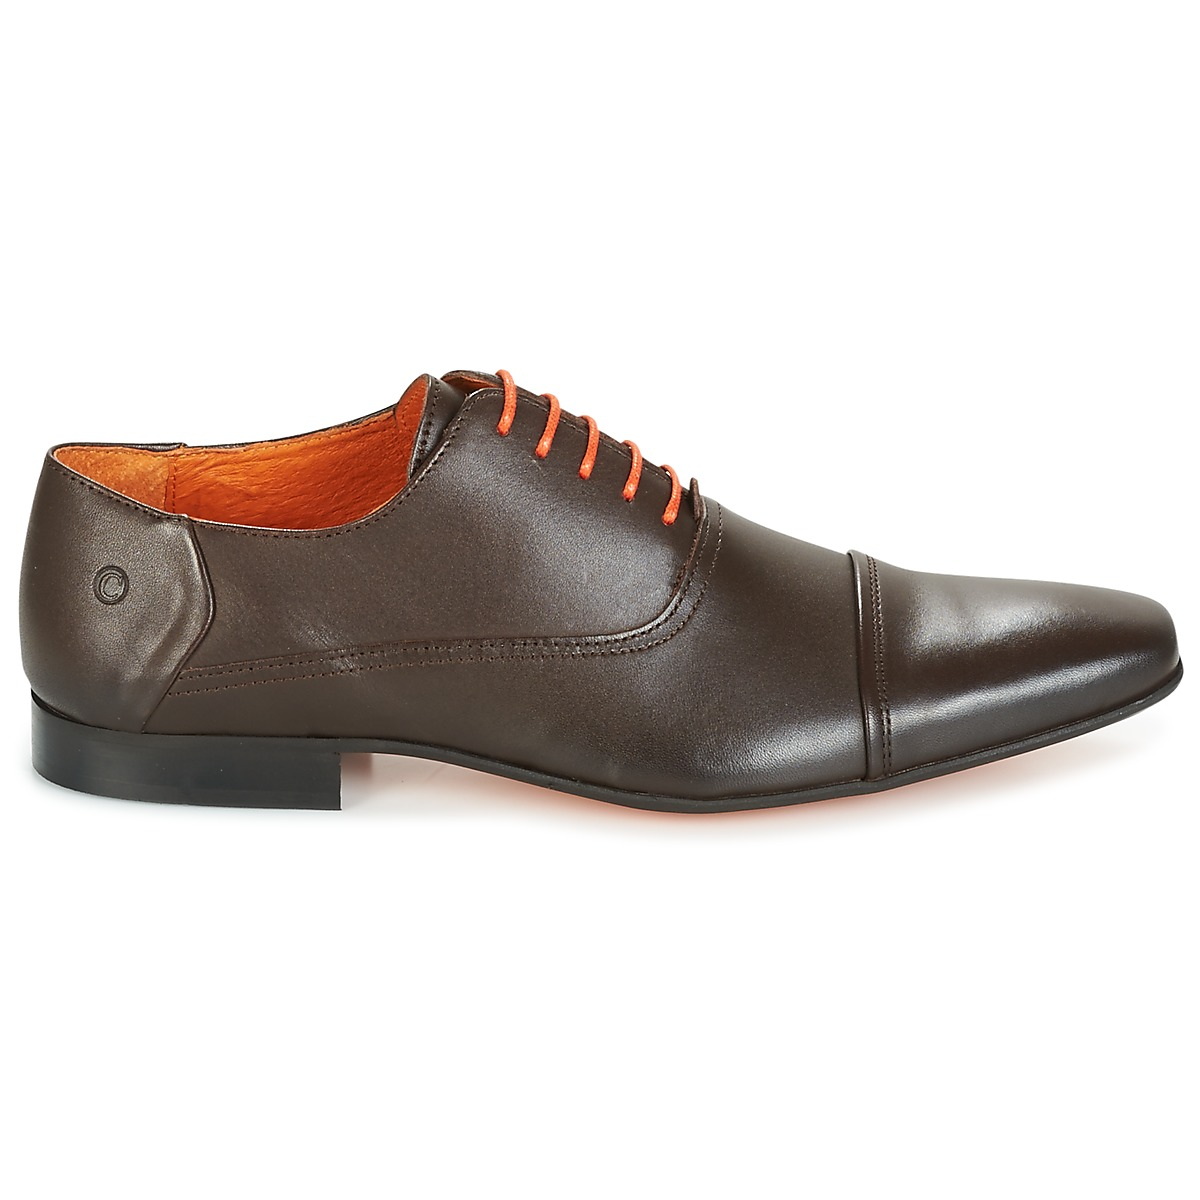 811112051100, Chaussures Derby Homme - Marron - Marron (Cognac), 44 EUDaniel Hechter